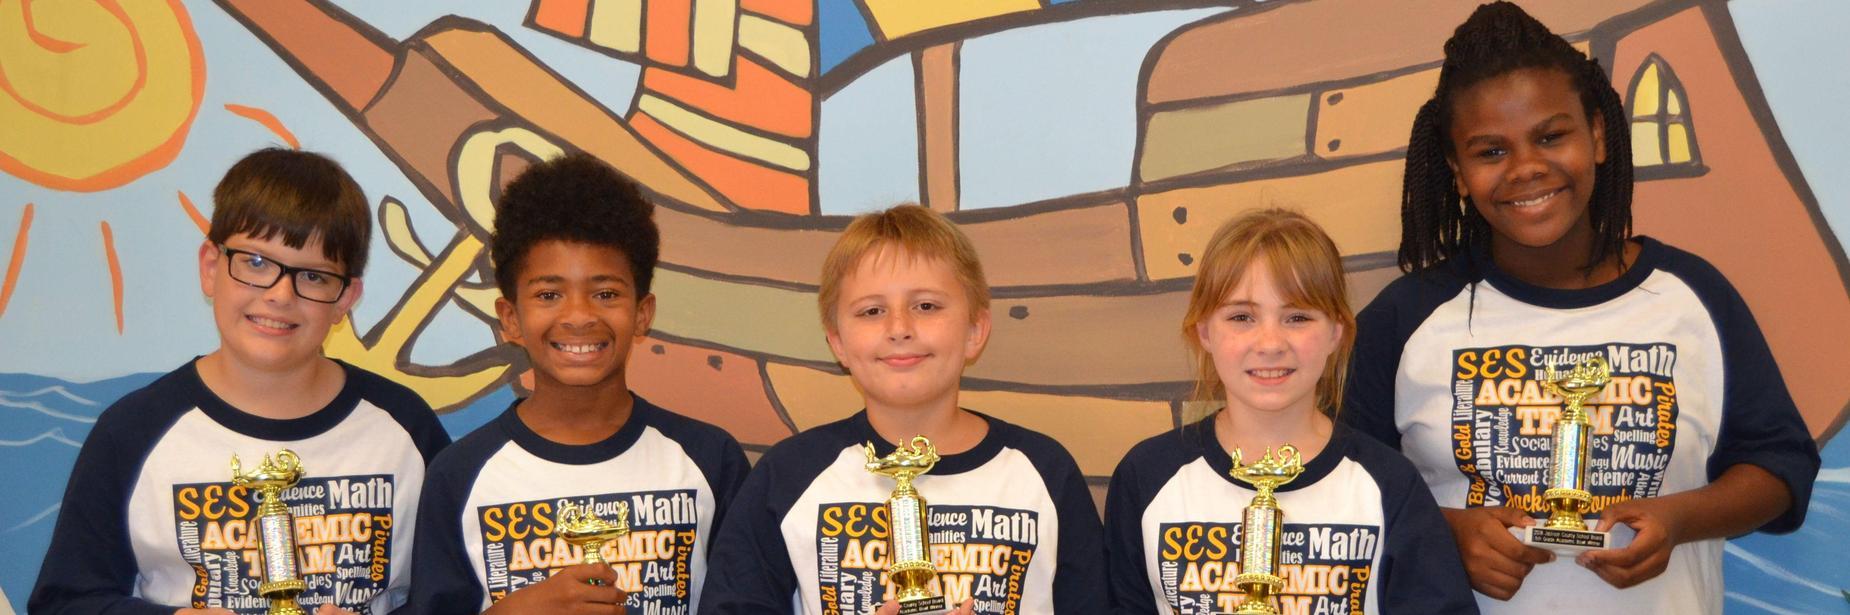 ses students receiving trophies